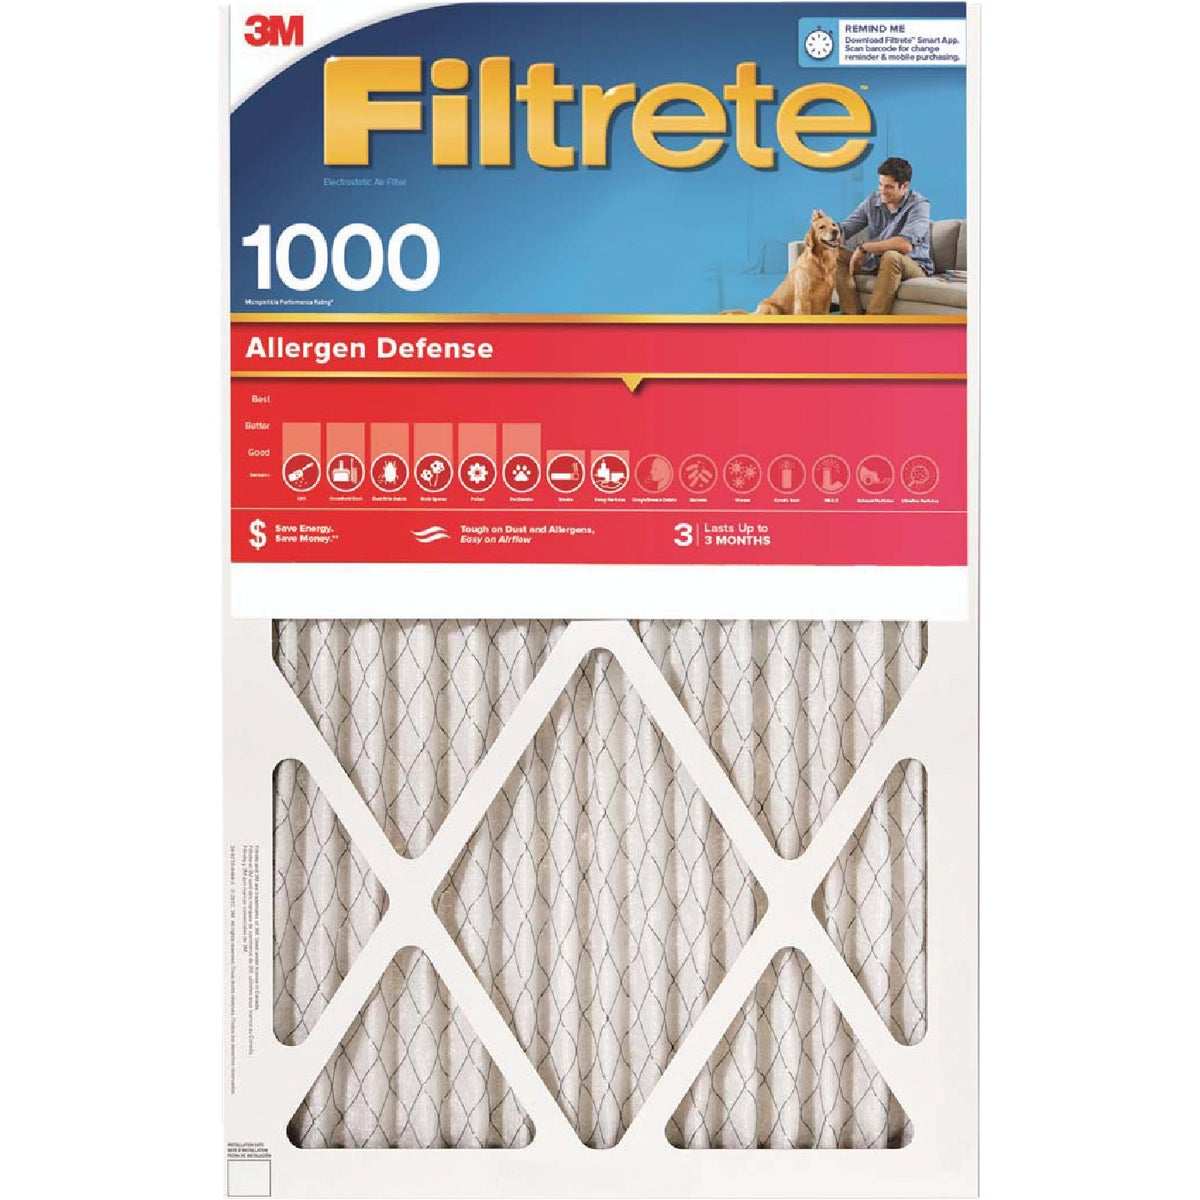 3M Filtrete 16 In. x 25 In. x 1 In. Allergen Defense 1000/1085 MPR Furnace Filter